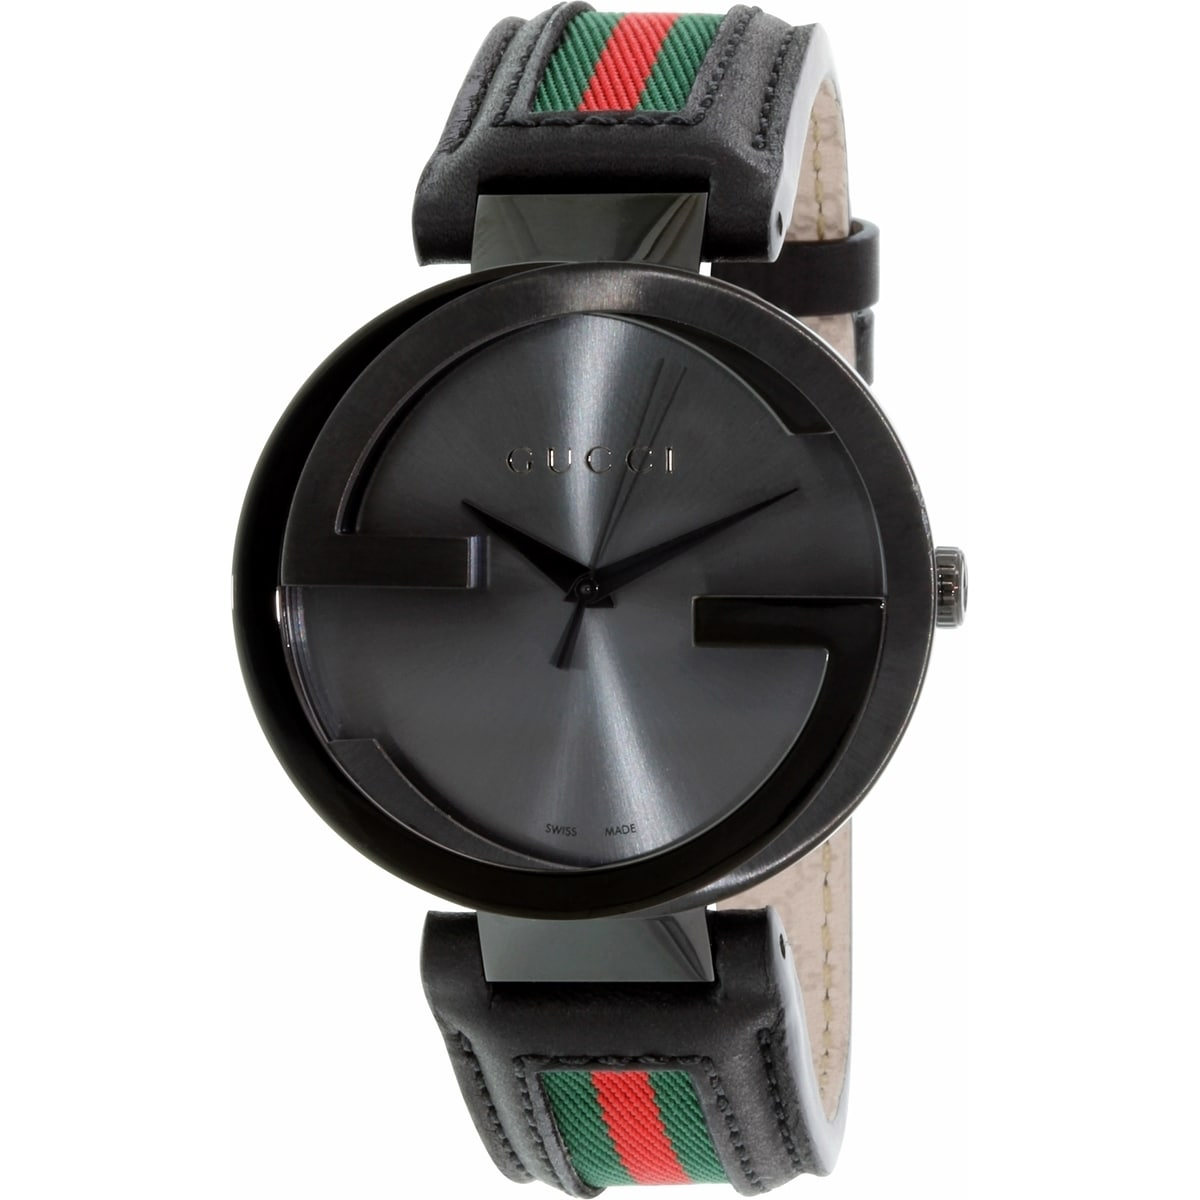 b173b1337ed Shop Gucci Men s YA133206 Quartz Interlocking Black Dial Black Leather Watch  - Free Shipping Today - Overstock - 9770779